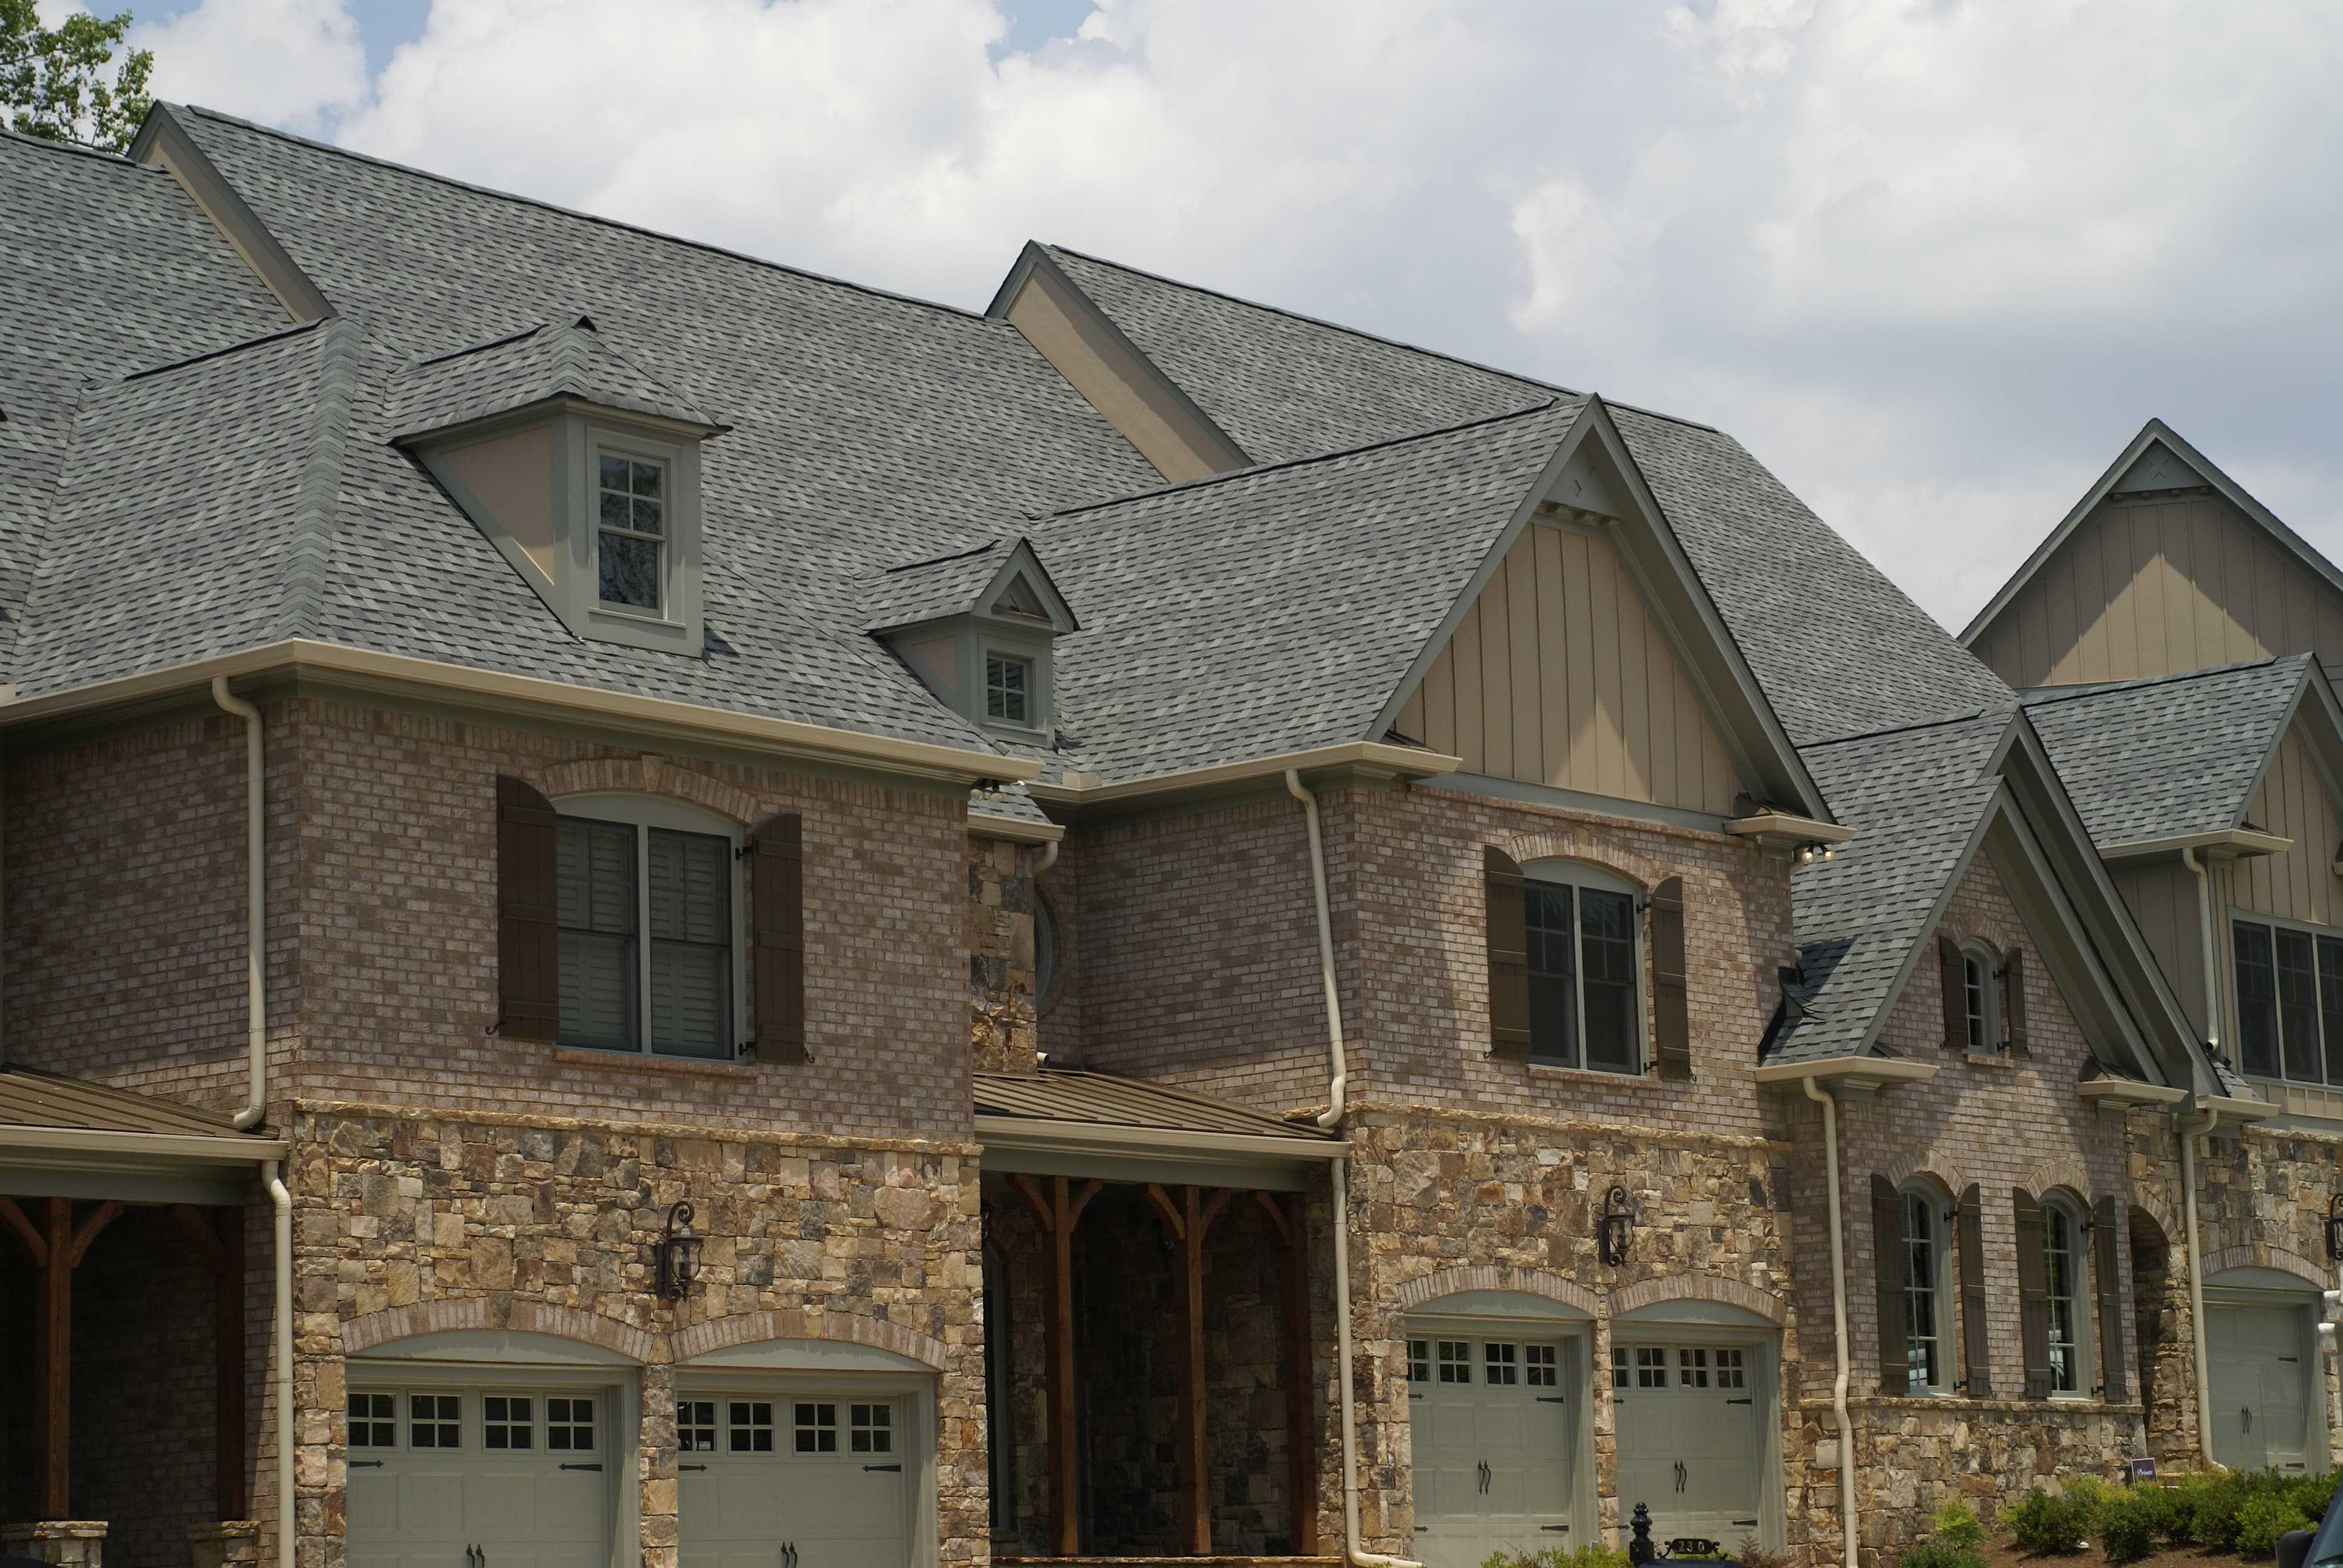 Pinnacle Hearthstone Gray Asphalt Roofing Manufacturers